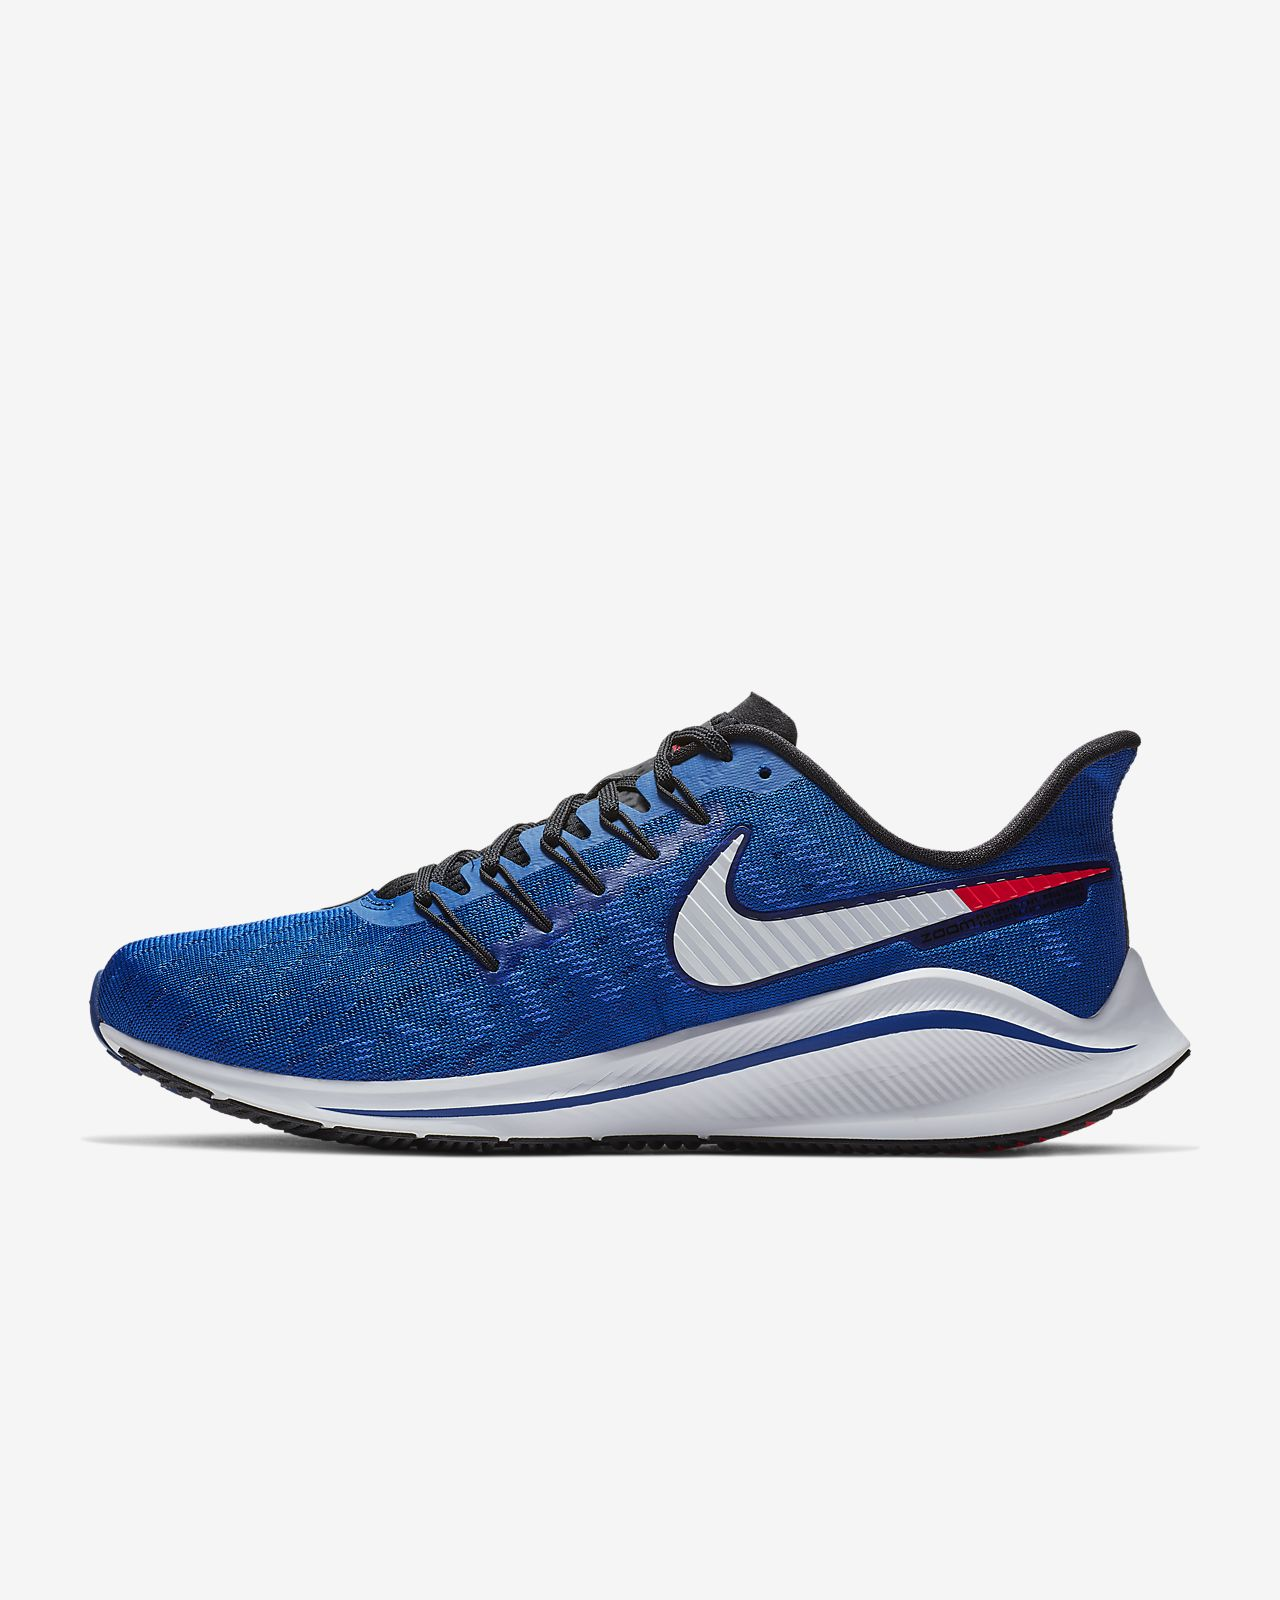 online retailer b0622 079f4 Scarpa da running Nike Air Zoom Vomero 14 - Uomo